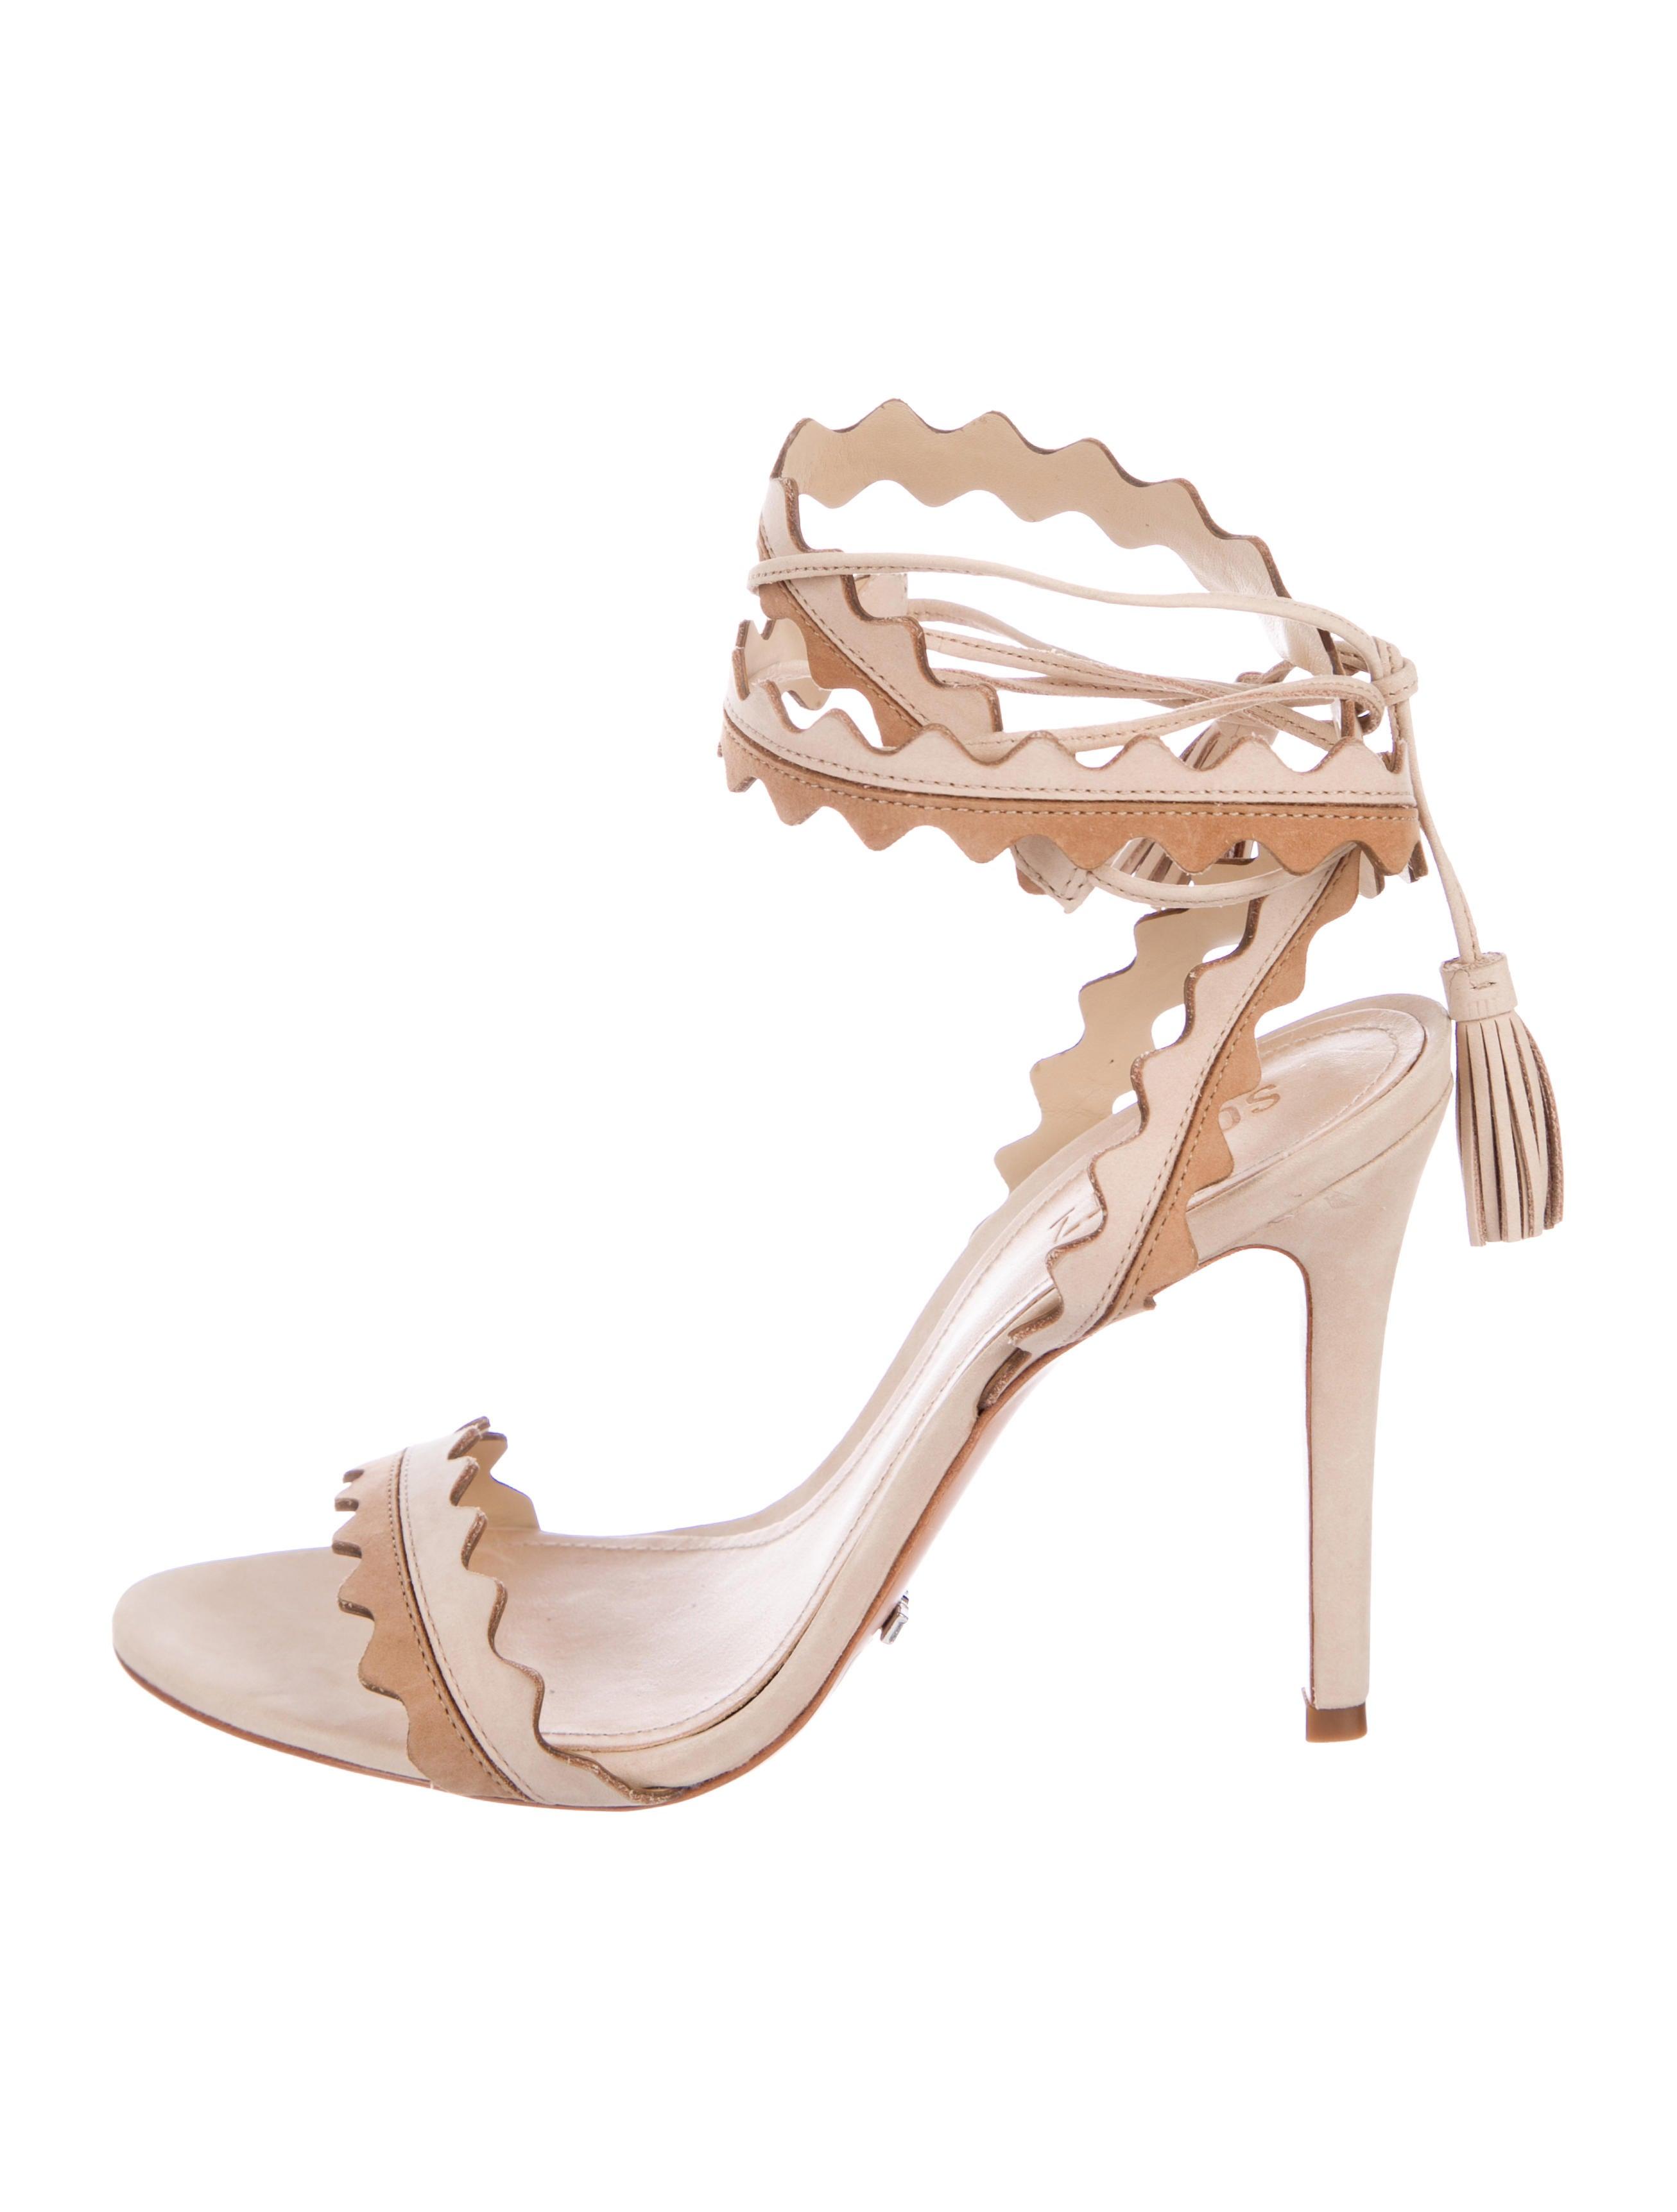 Schutz Liana Leather Sandals outlet store online oT2kO0